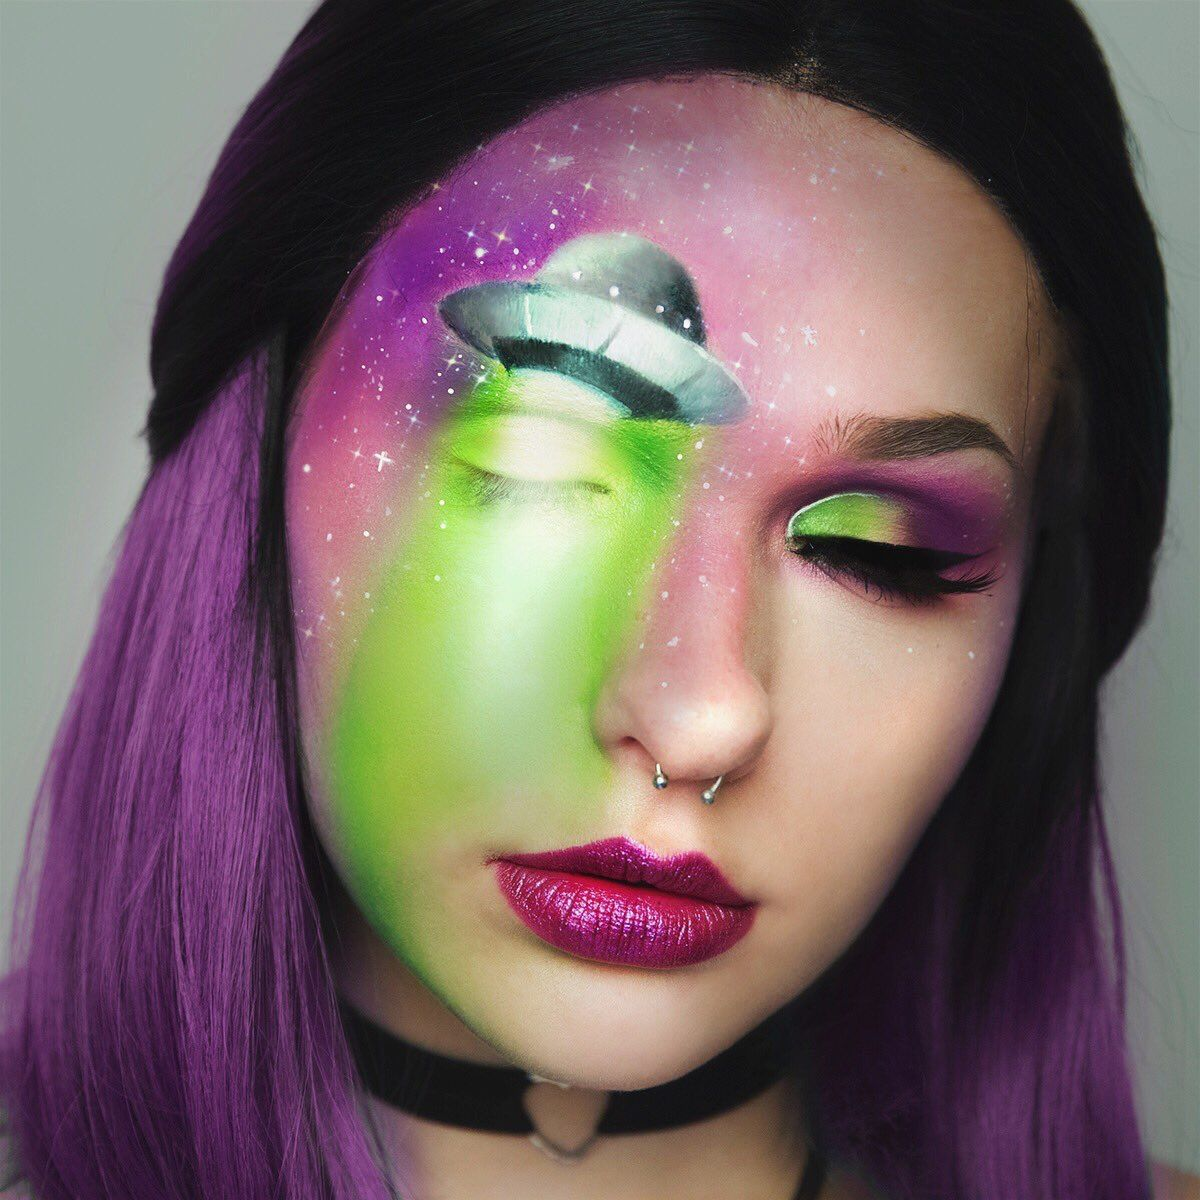 Pin de Claire Bowen en Makeup. Maquillaje artístico